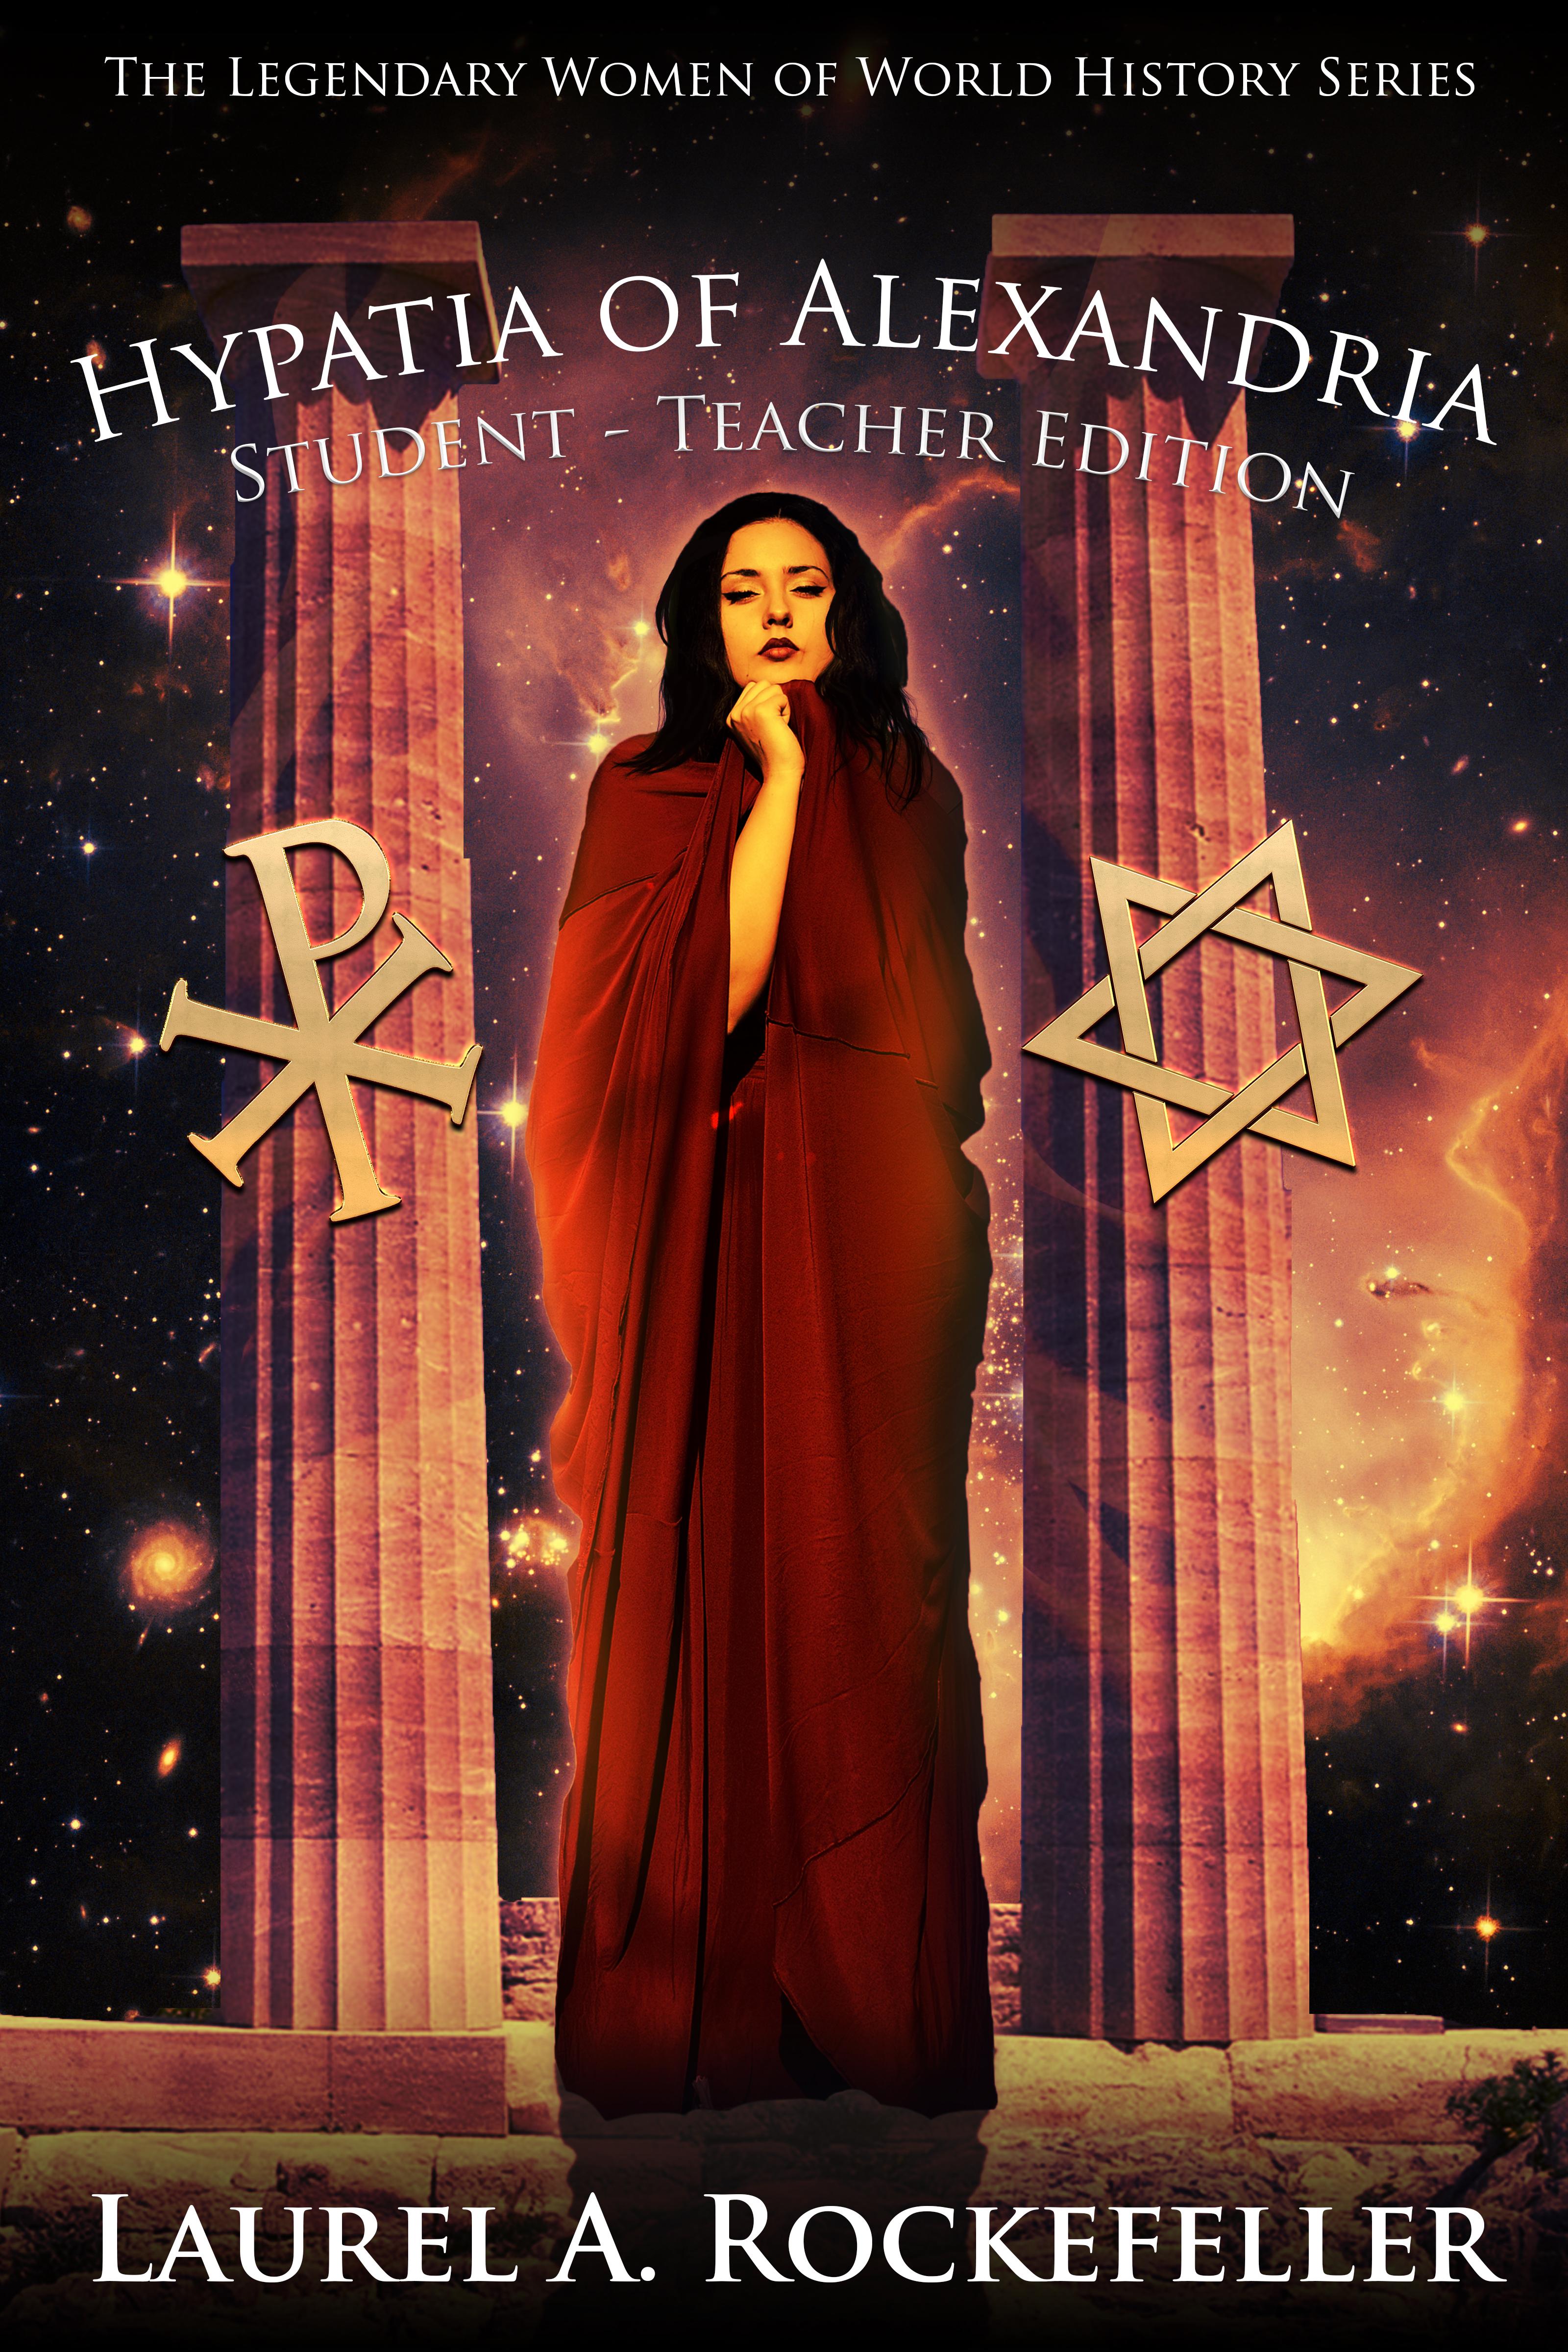 Hypatia of alexandria: student - teacher edition